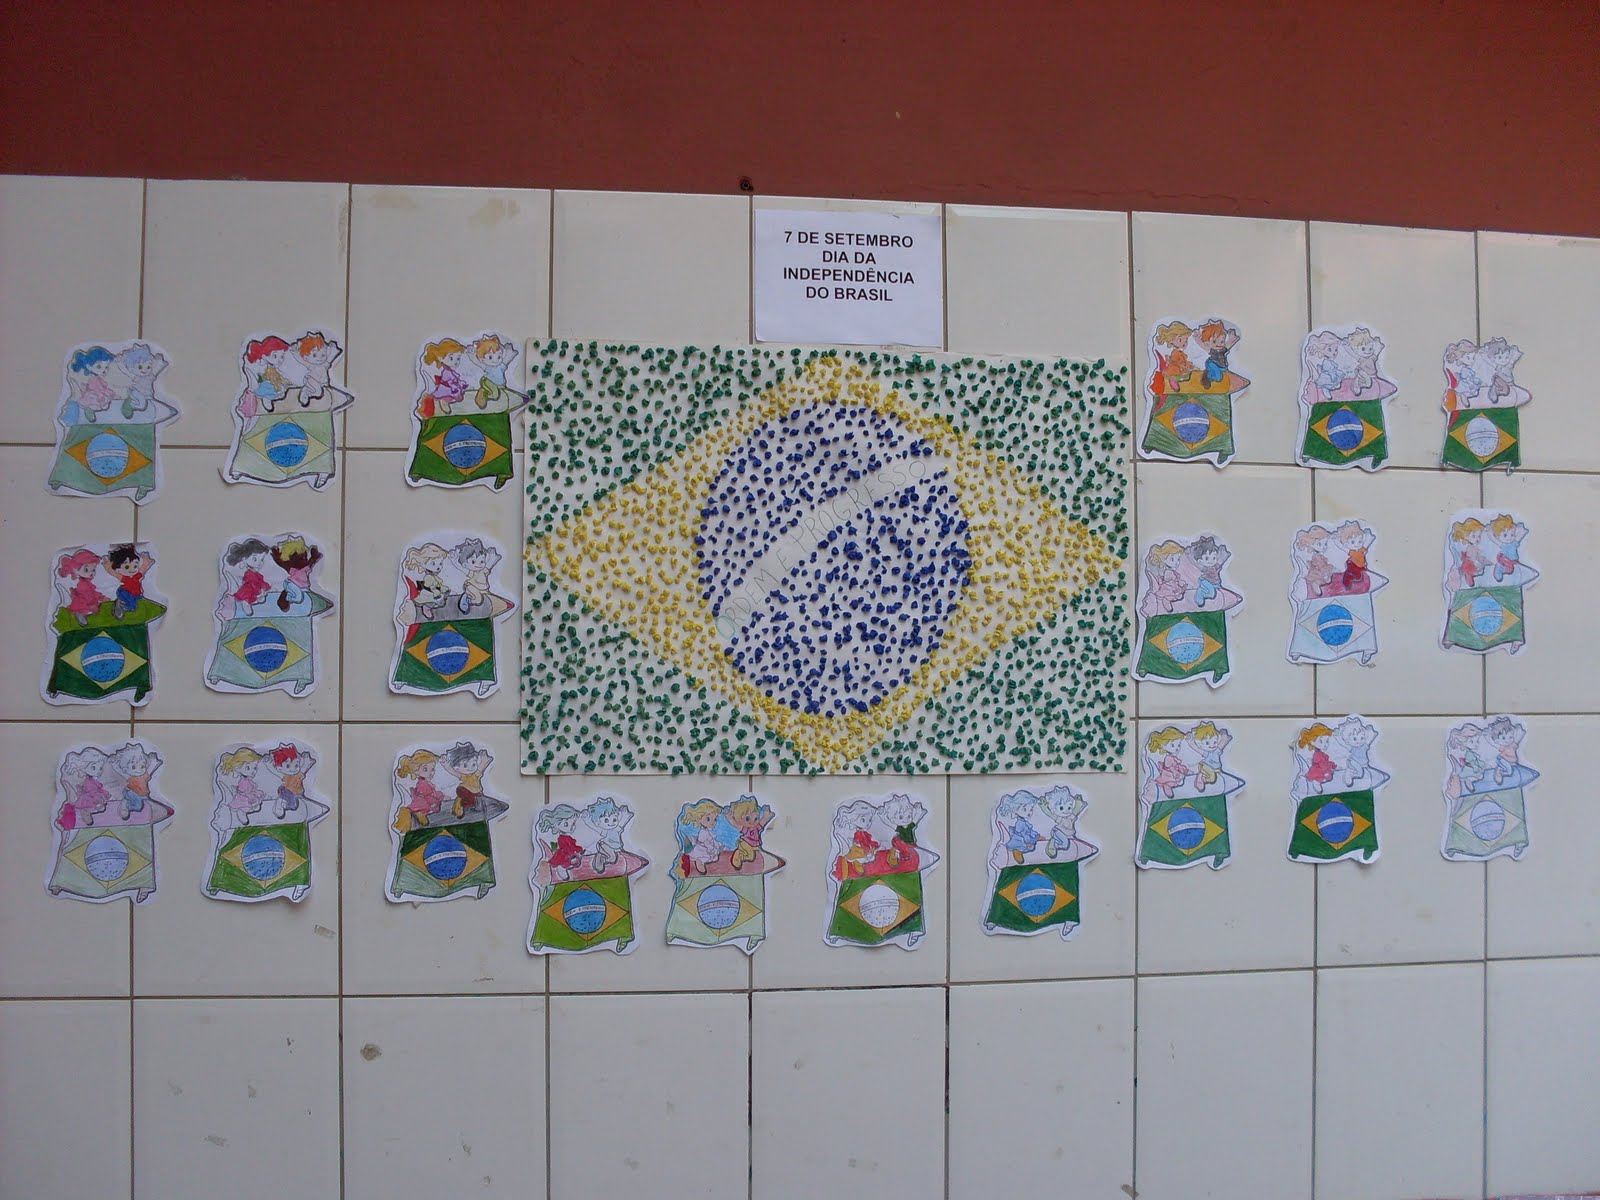 Escola estadual nossa senhora do belo ramo setembro 2011 for Mural 7 de setembro